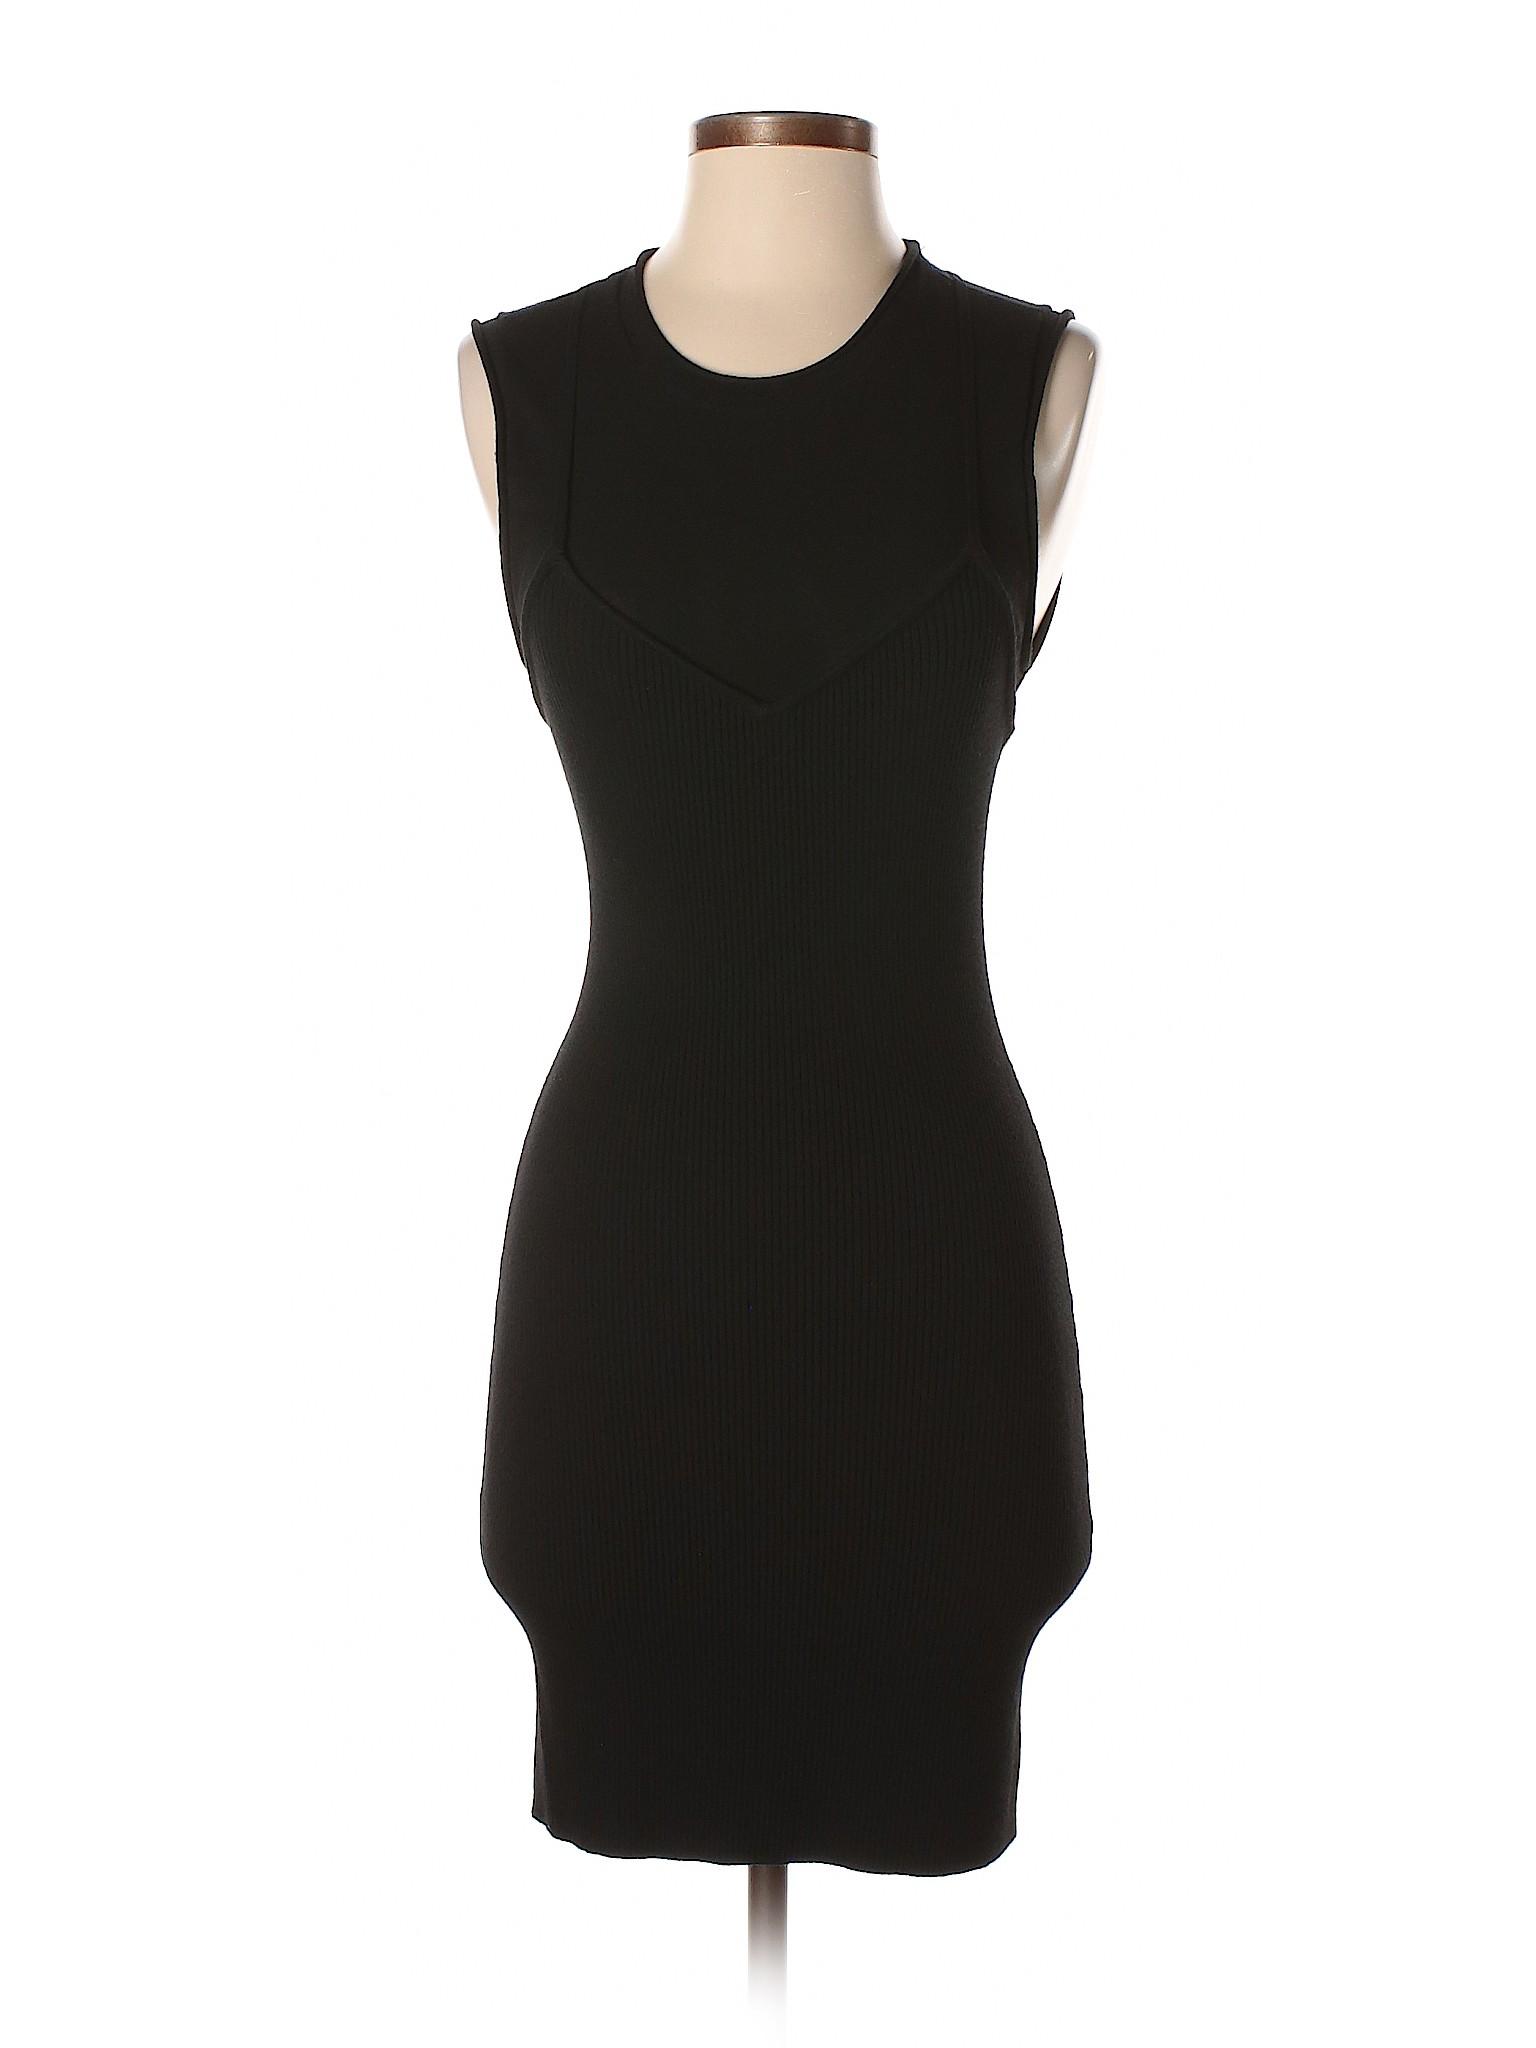 c Casual A Dress Boutique Winter l 6xOqwgPg